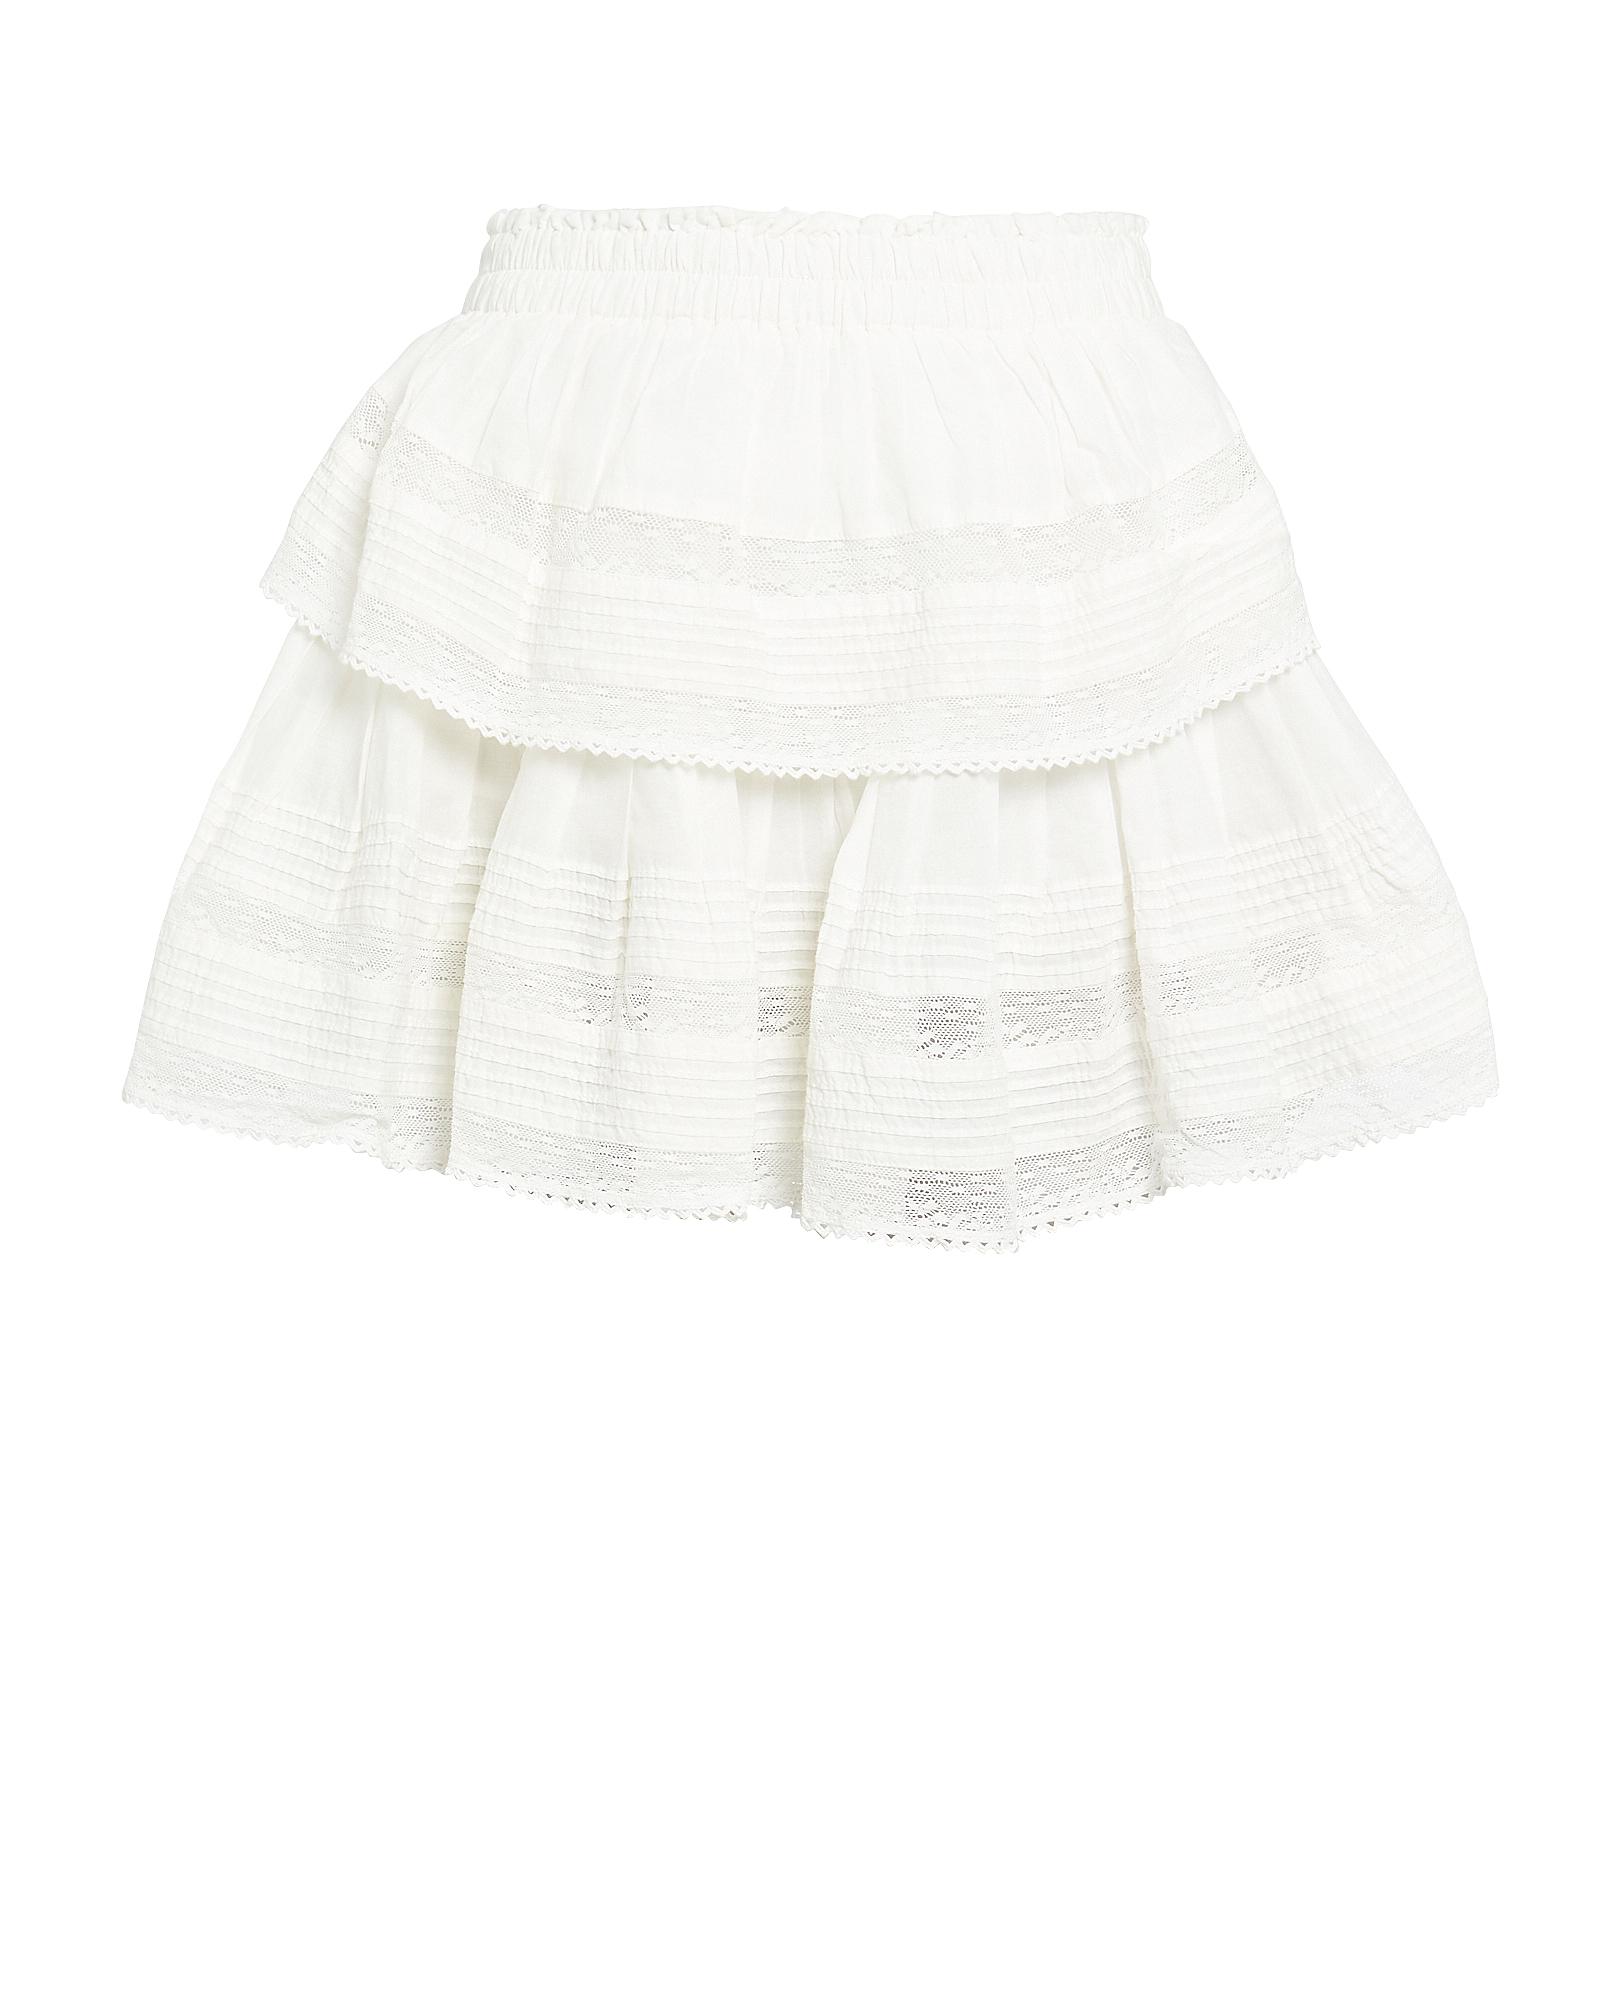 Loveshackfancy Skirts LOVESHACKFANCY RUFFLED LACE-TRIM COTTON SKIRT